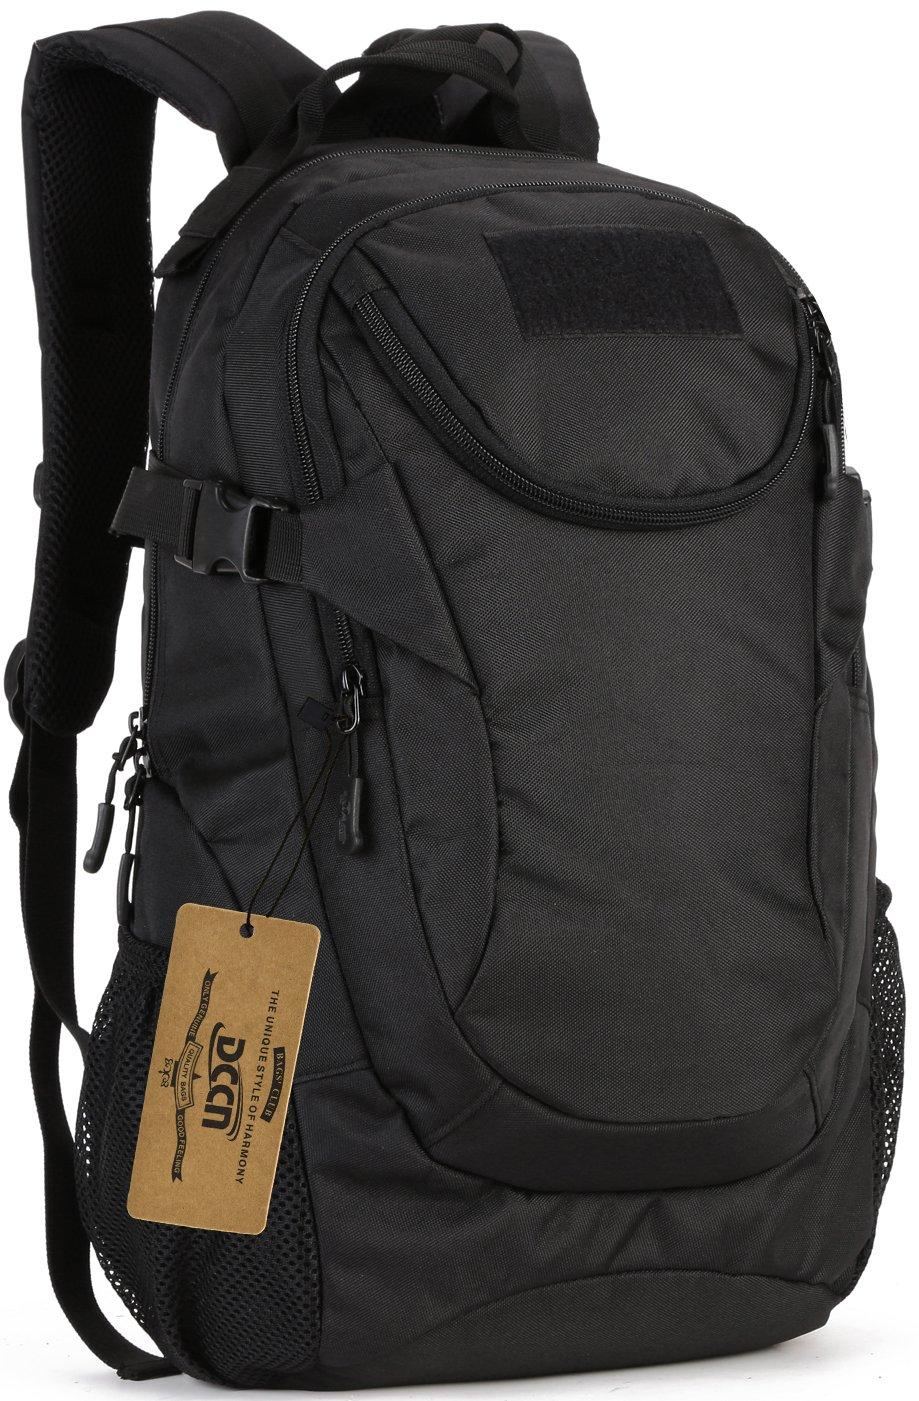 DCCN 25L T/áctica Mochila al Aire Libre Mochila de Acampada Ciclismo Senderismo Deporte Backpack para Hombre Mujer